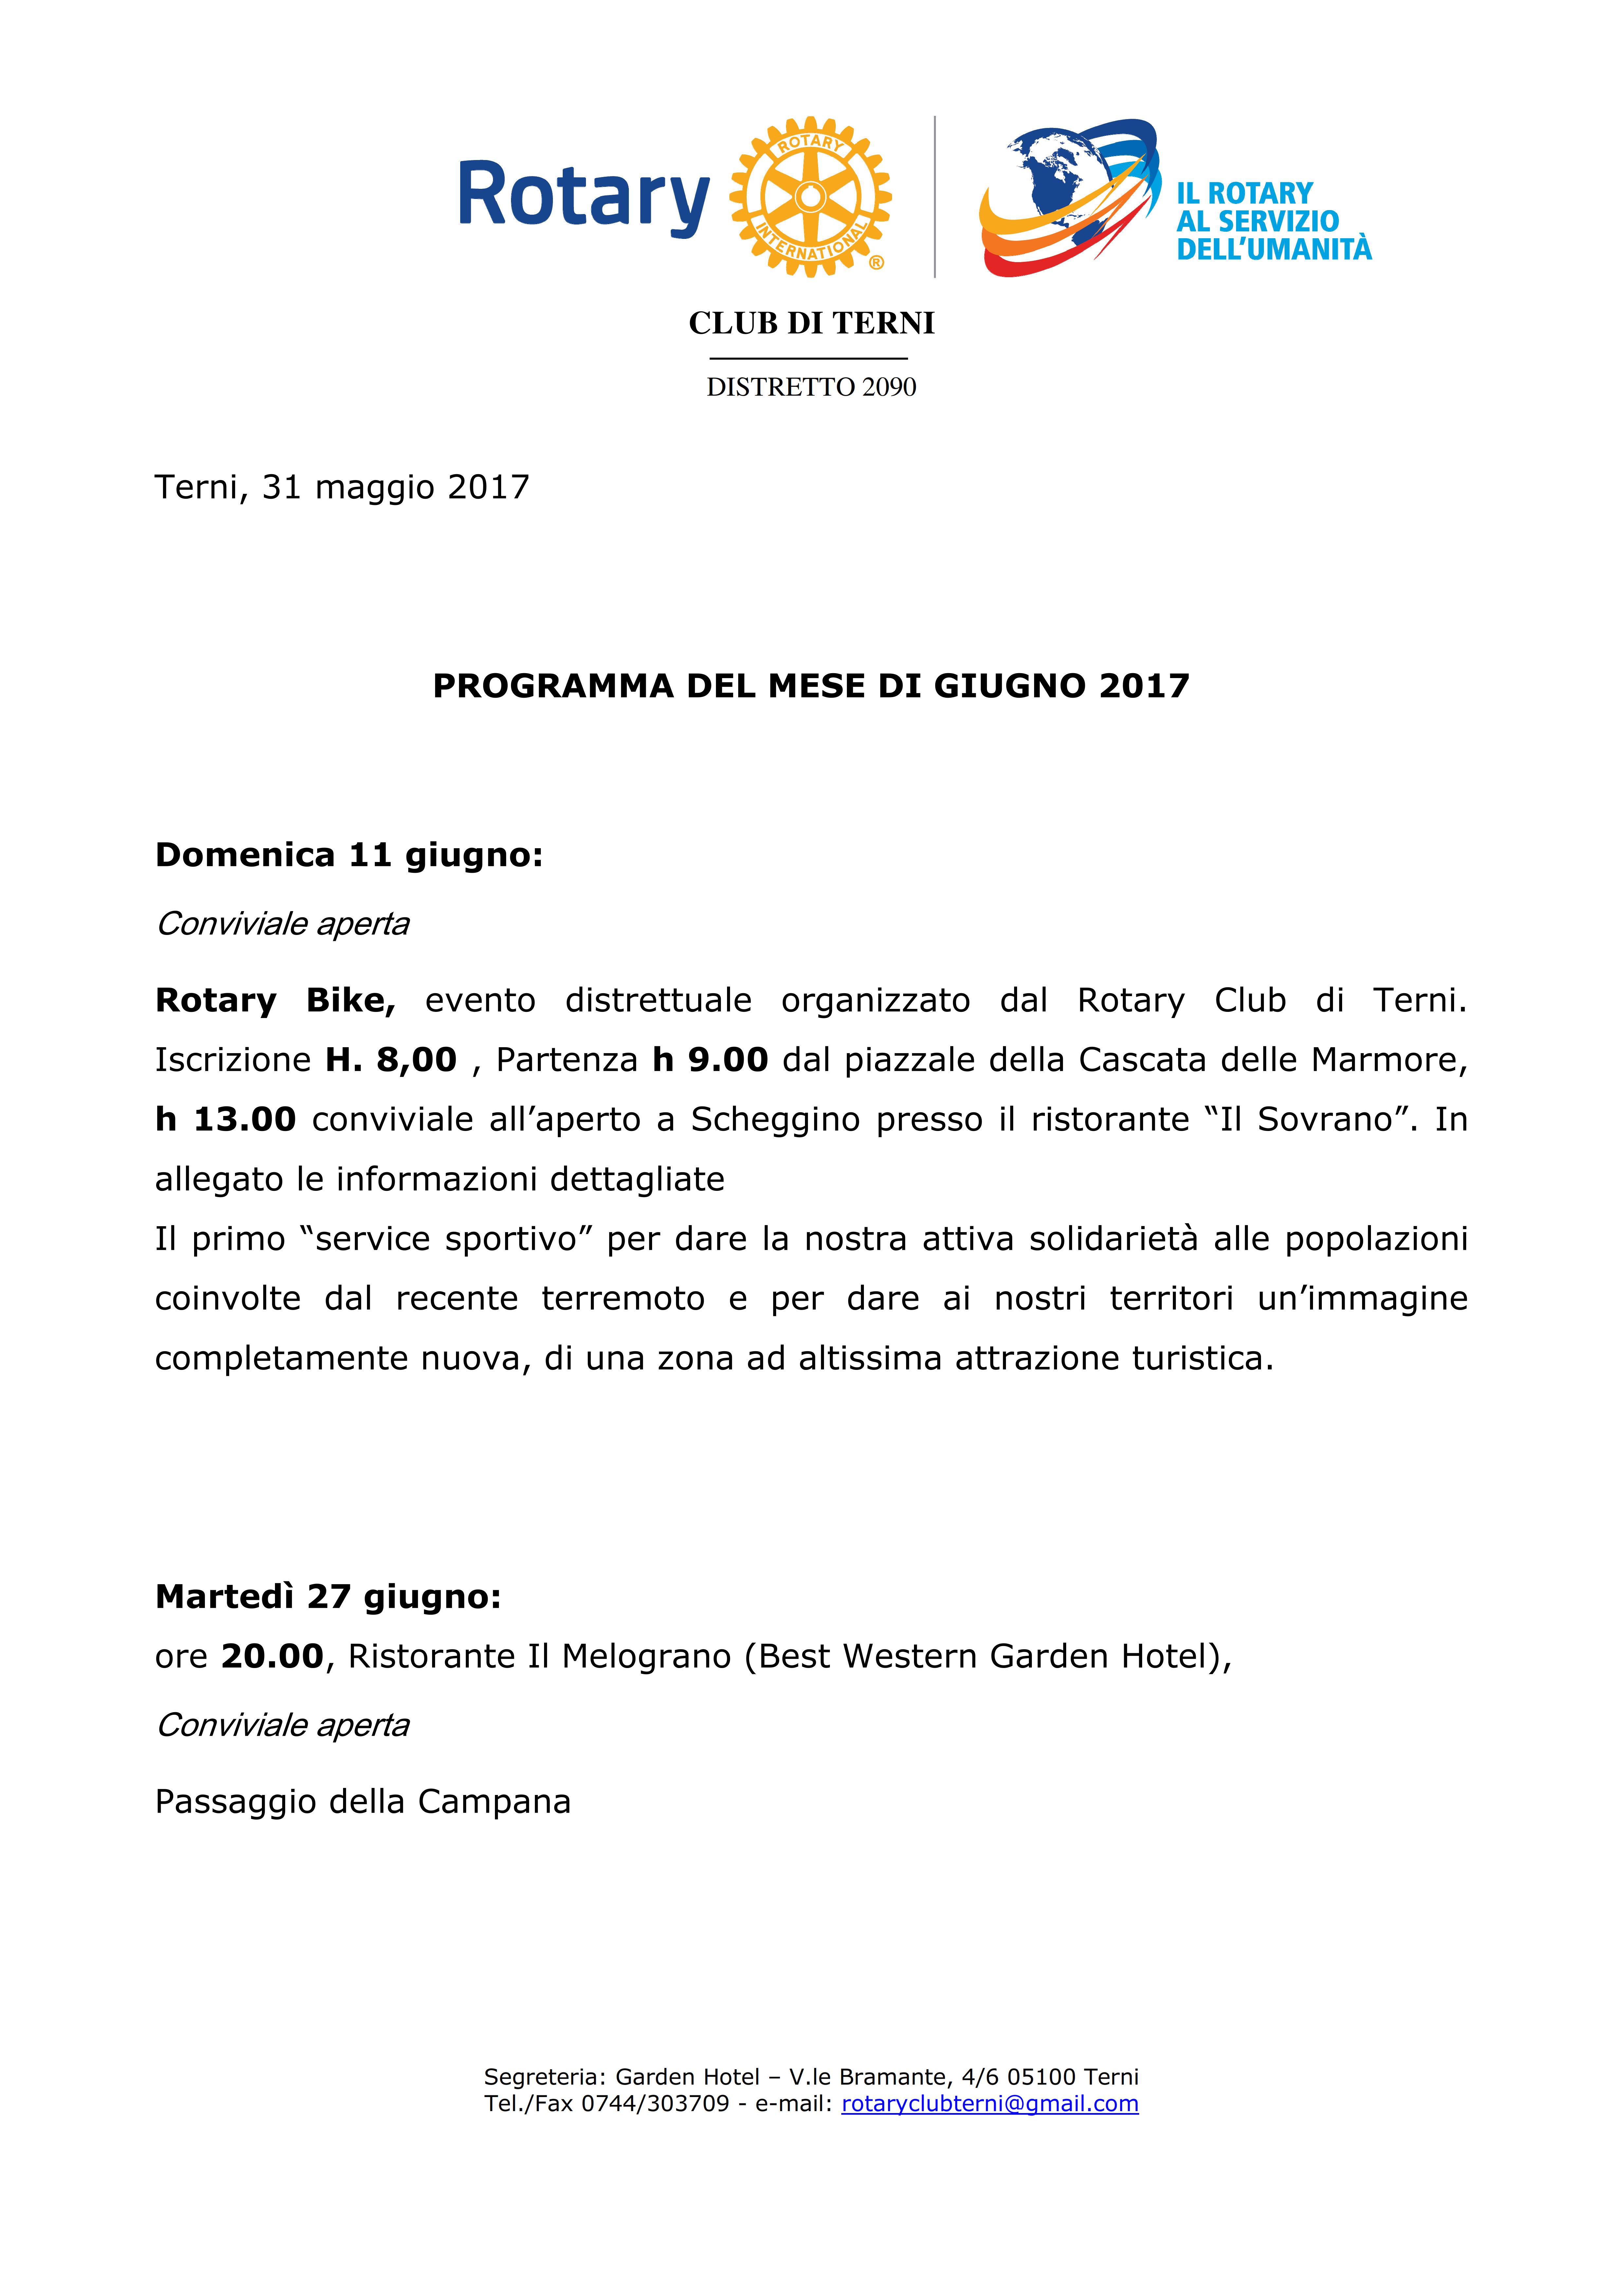 Rotary Club Terni - programma Giugno 2017_001